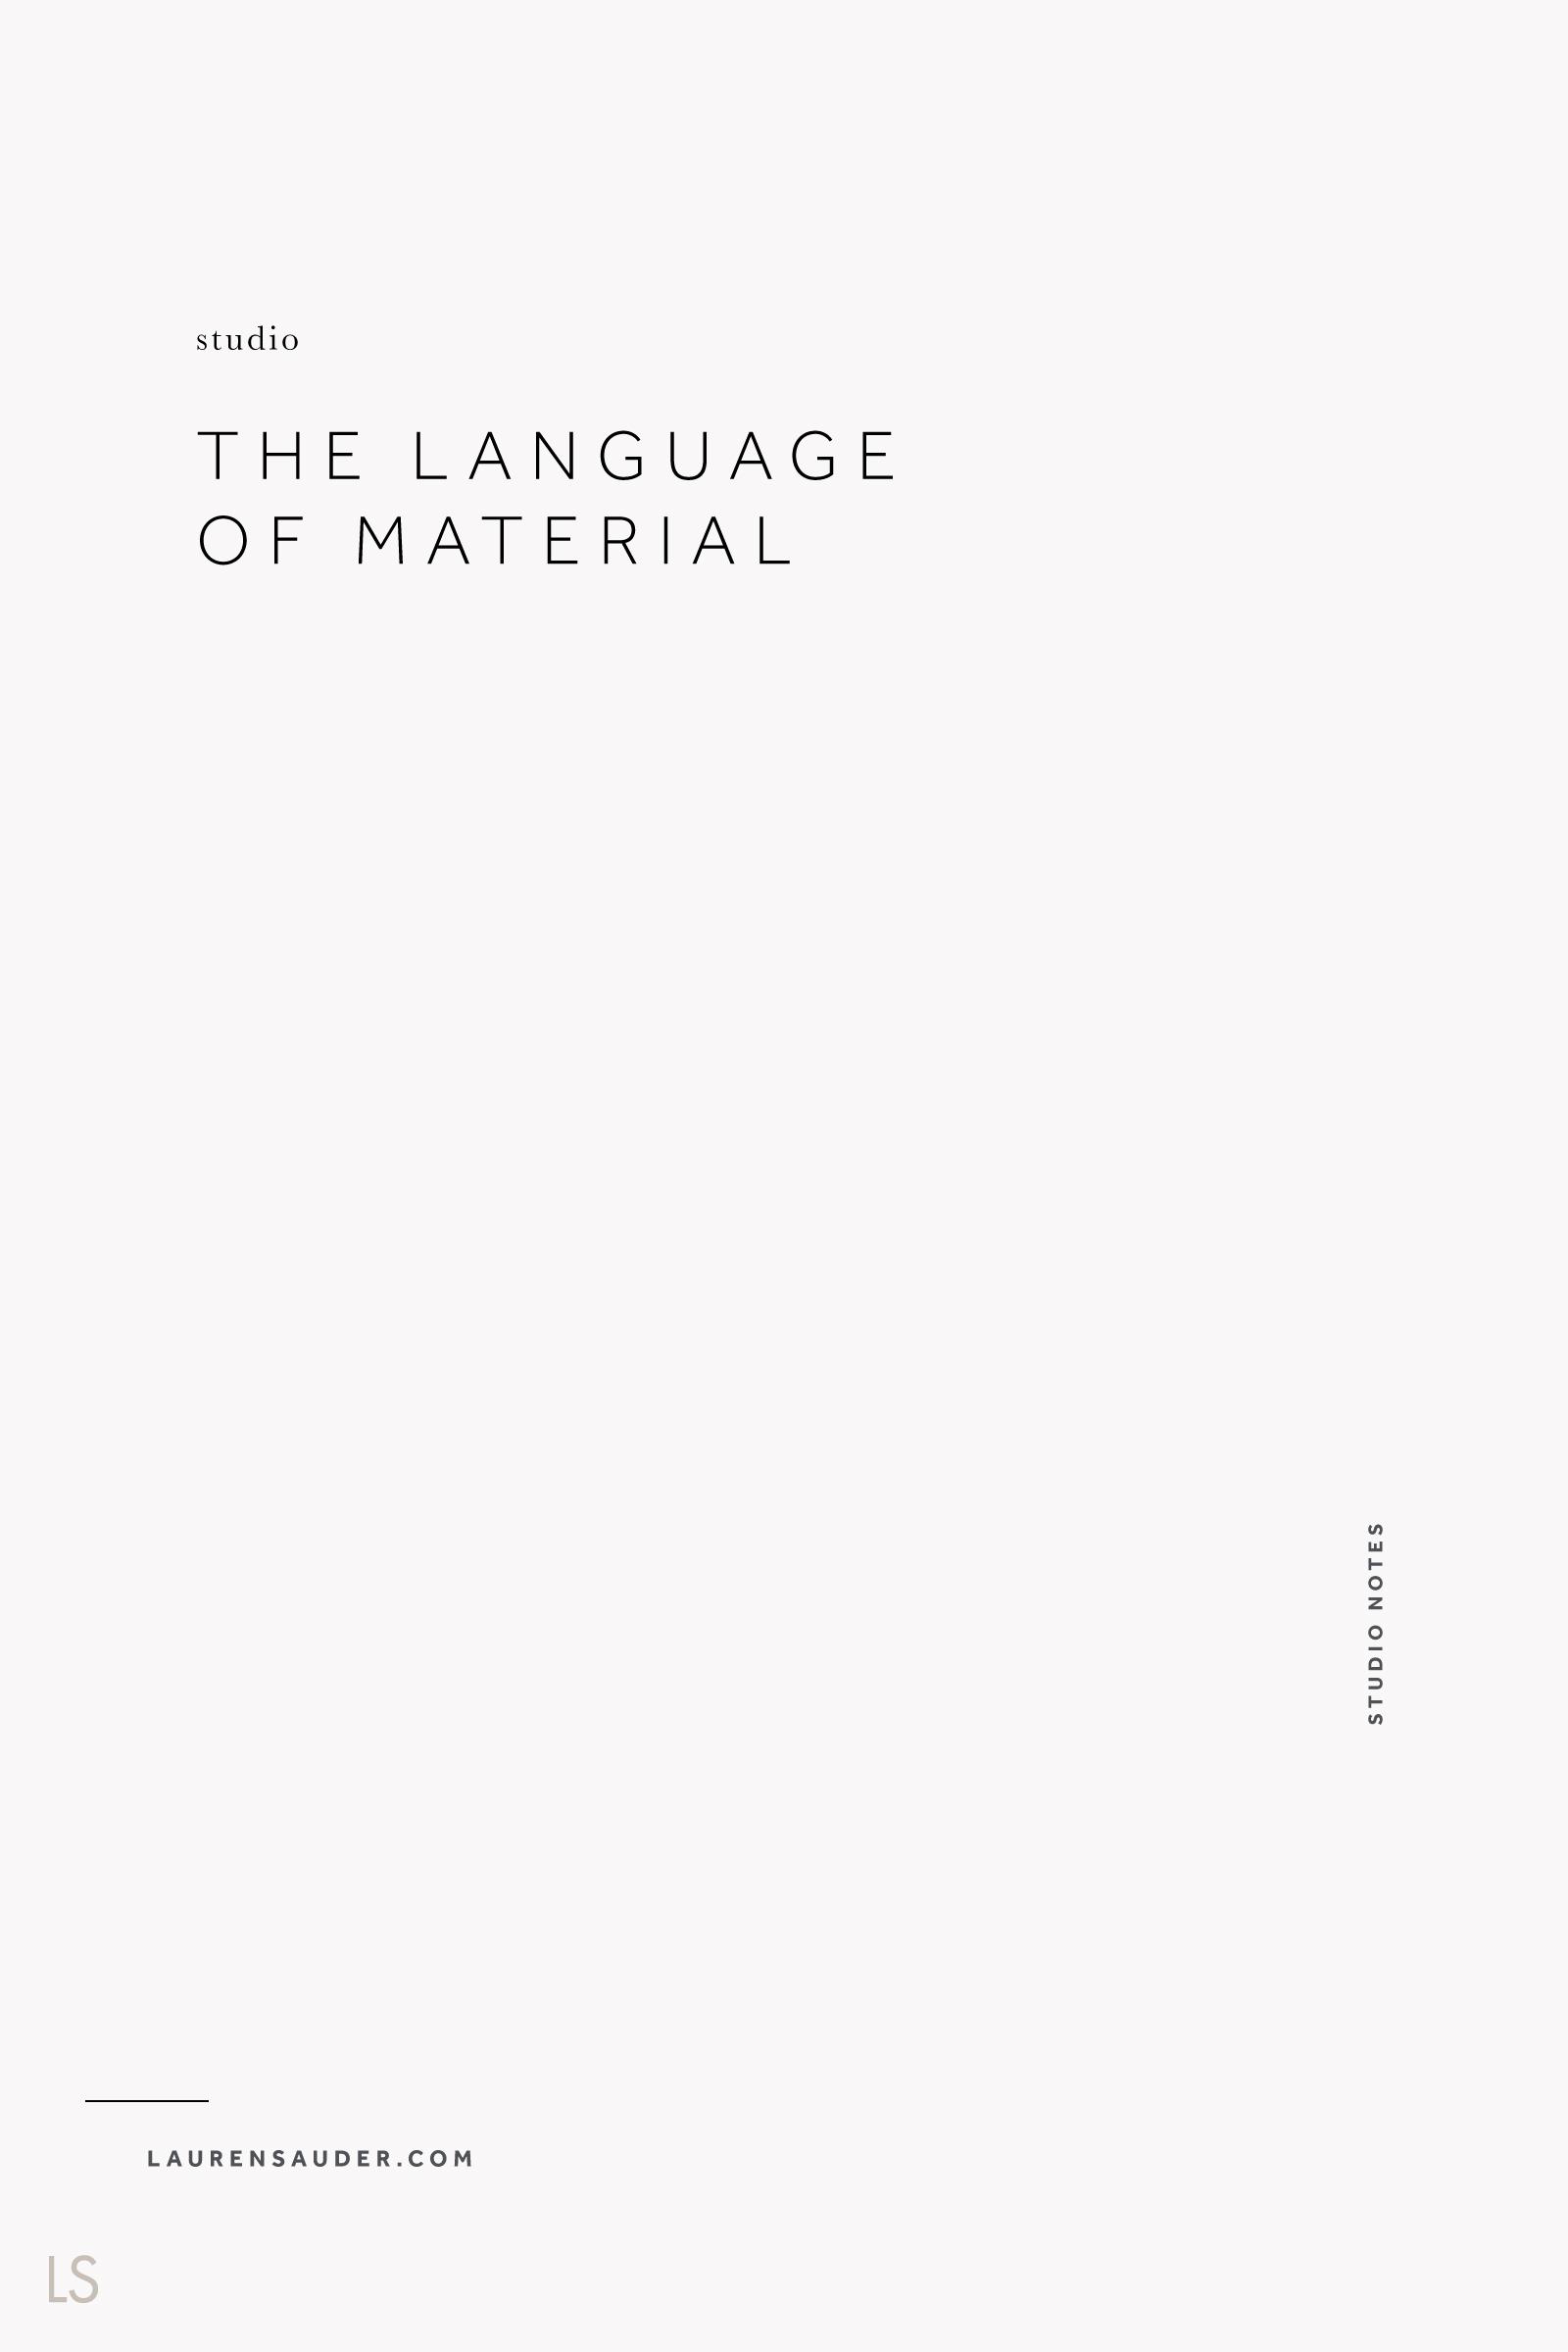 The Language of Material - Lauren Sauder